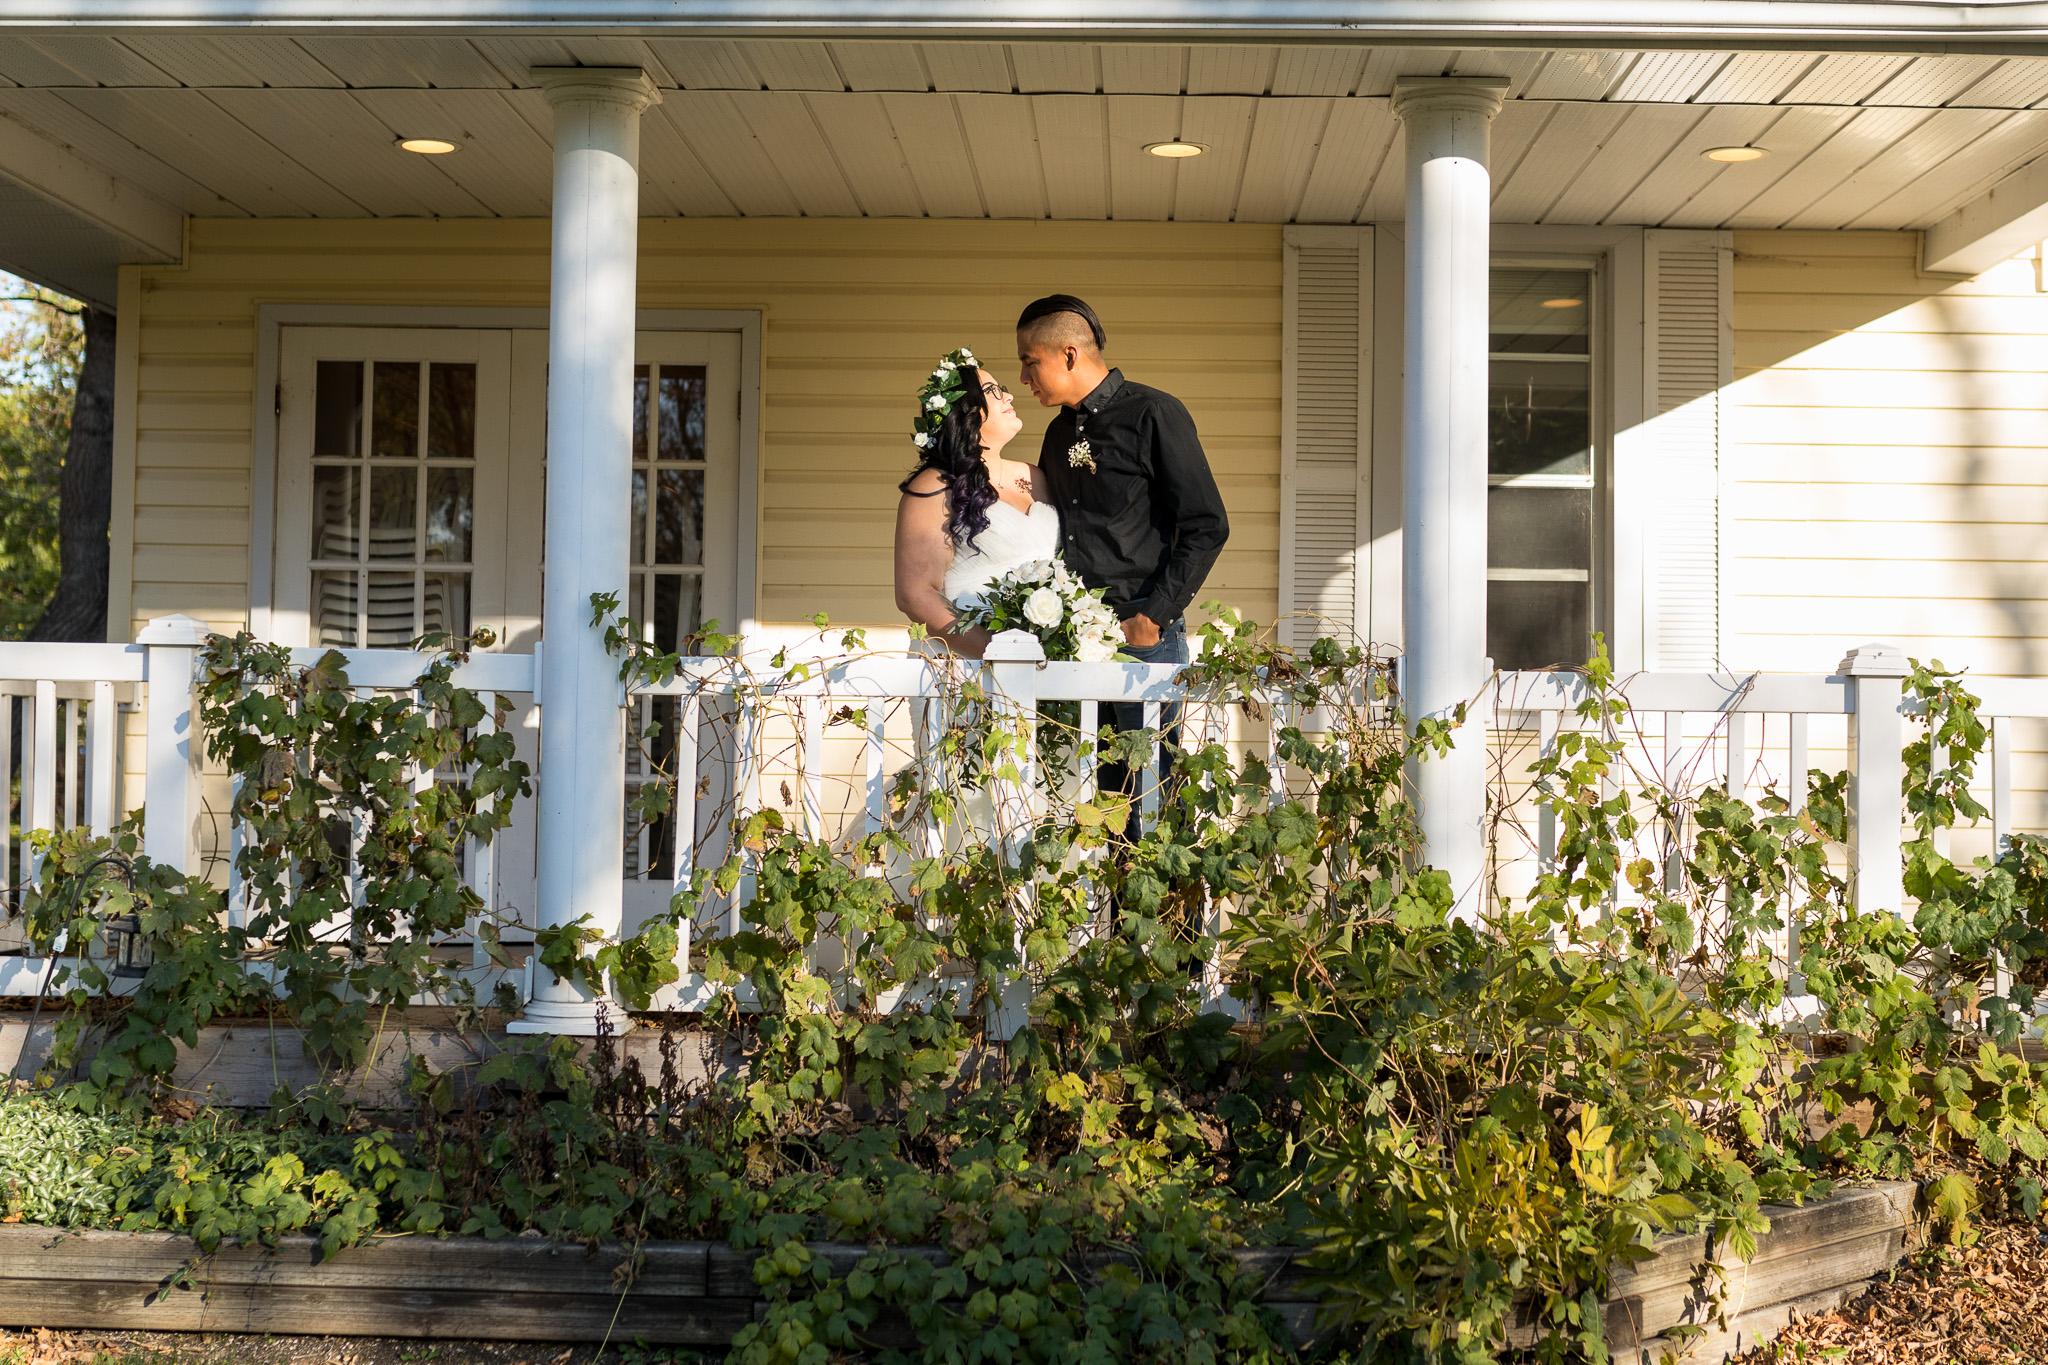 evergreen-village-winnipeg-wedding-36.jpg